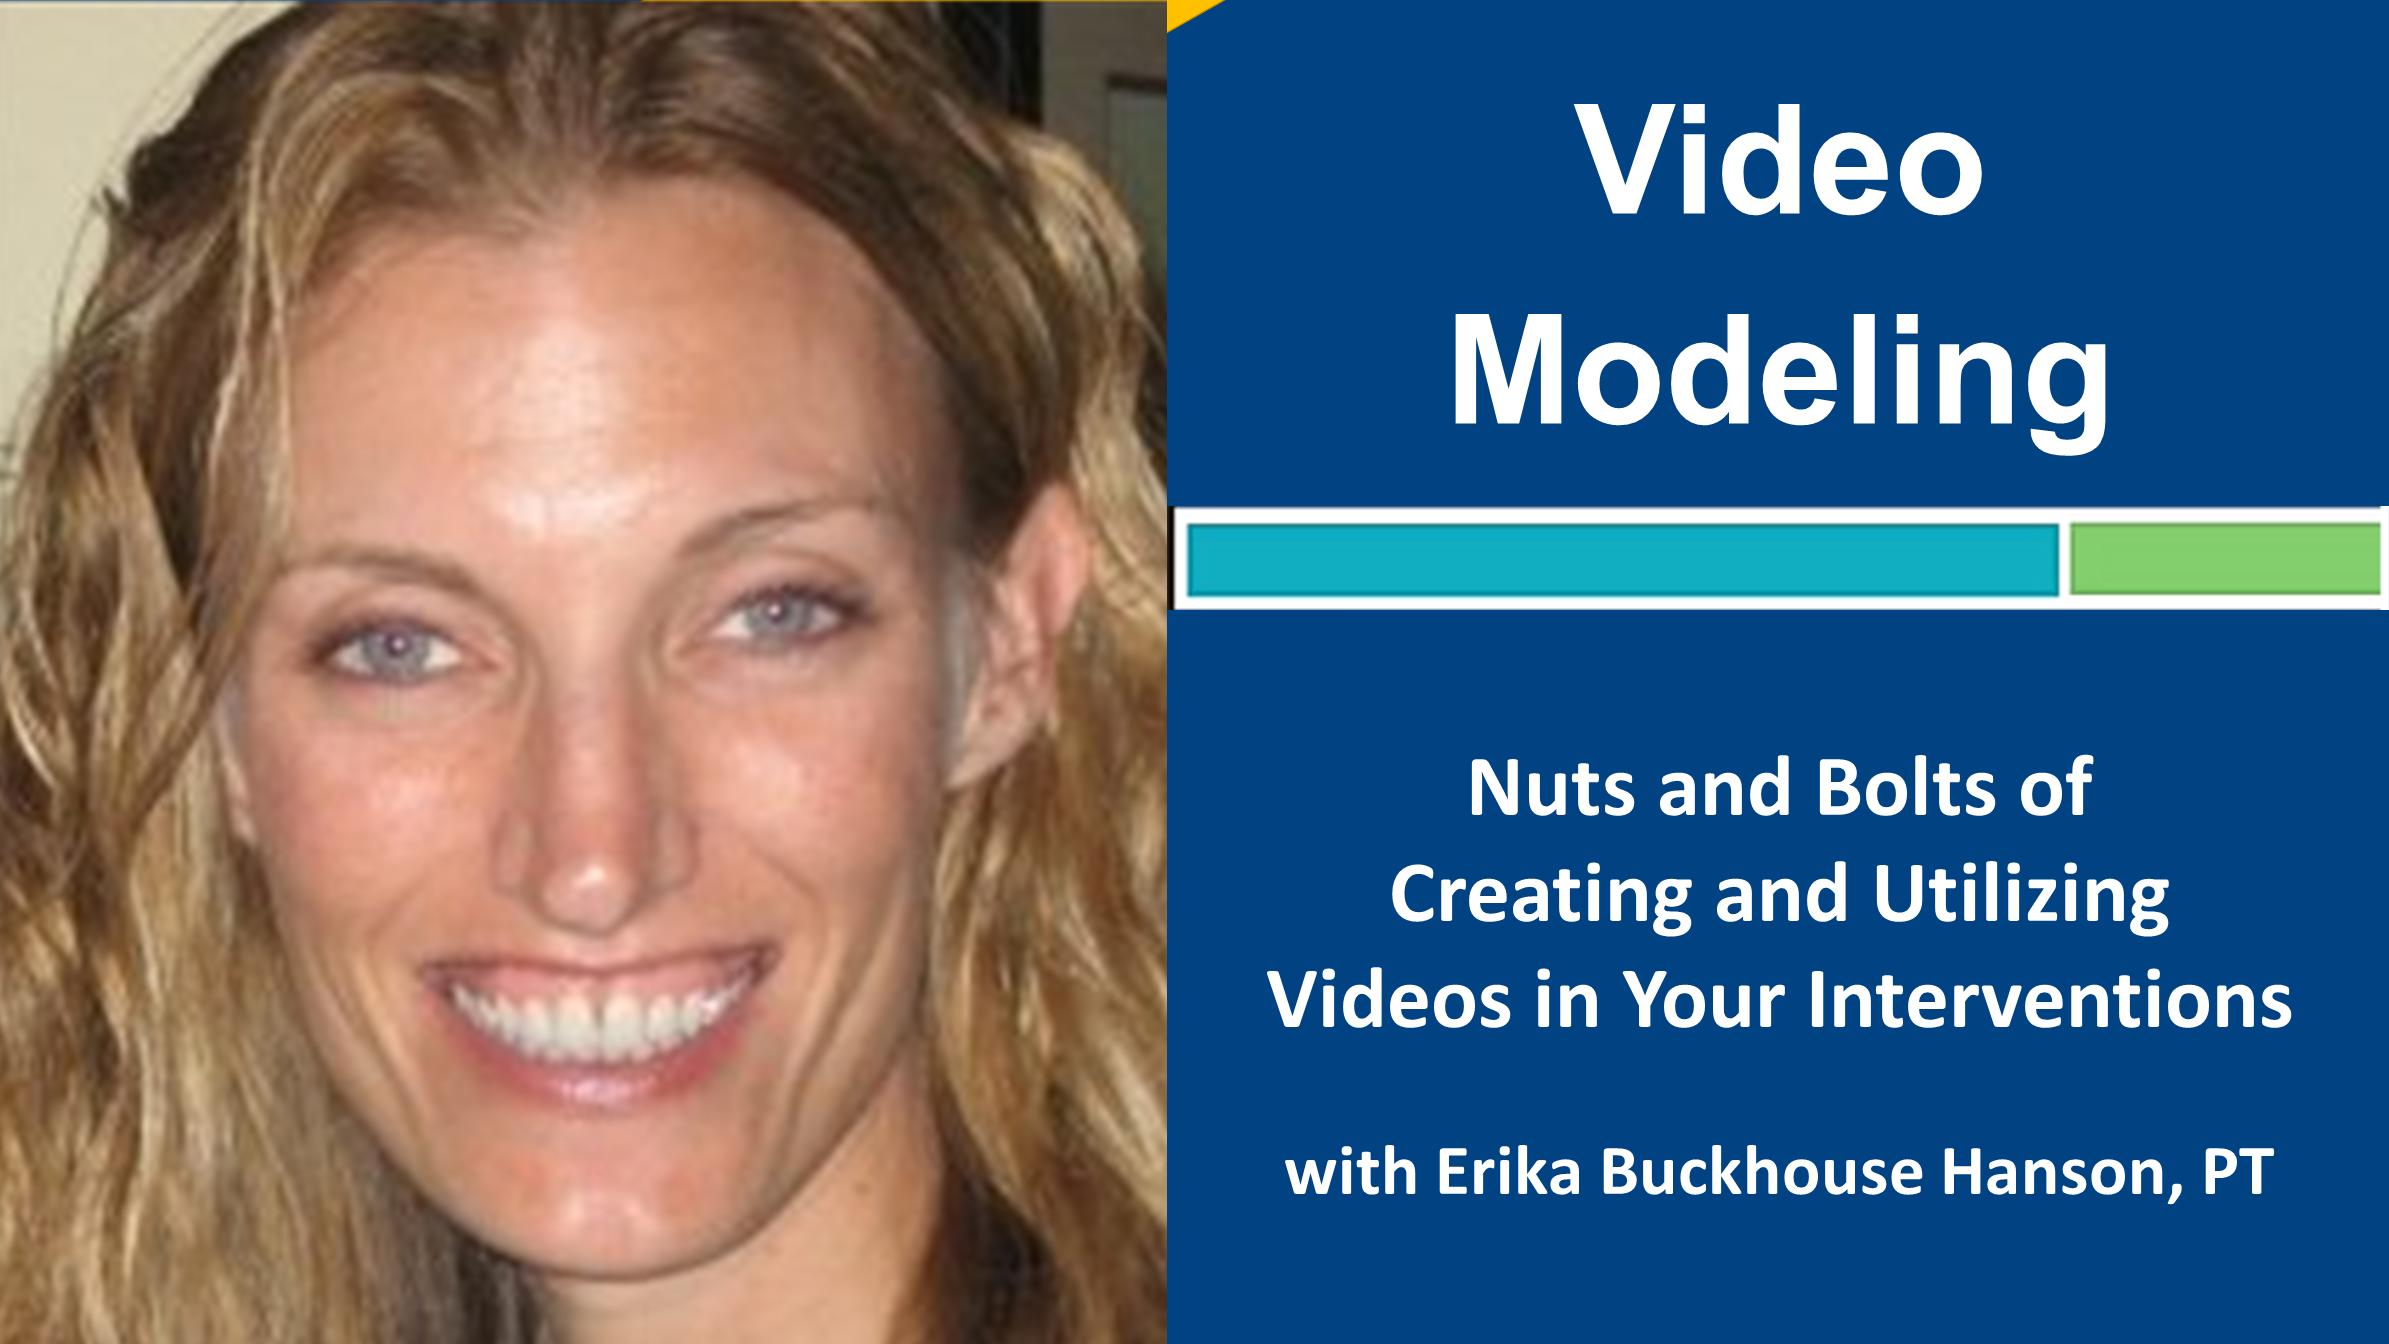 Webinar 3: Video Modeling with Erika Buckhouse Hanson, PT